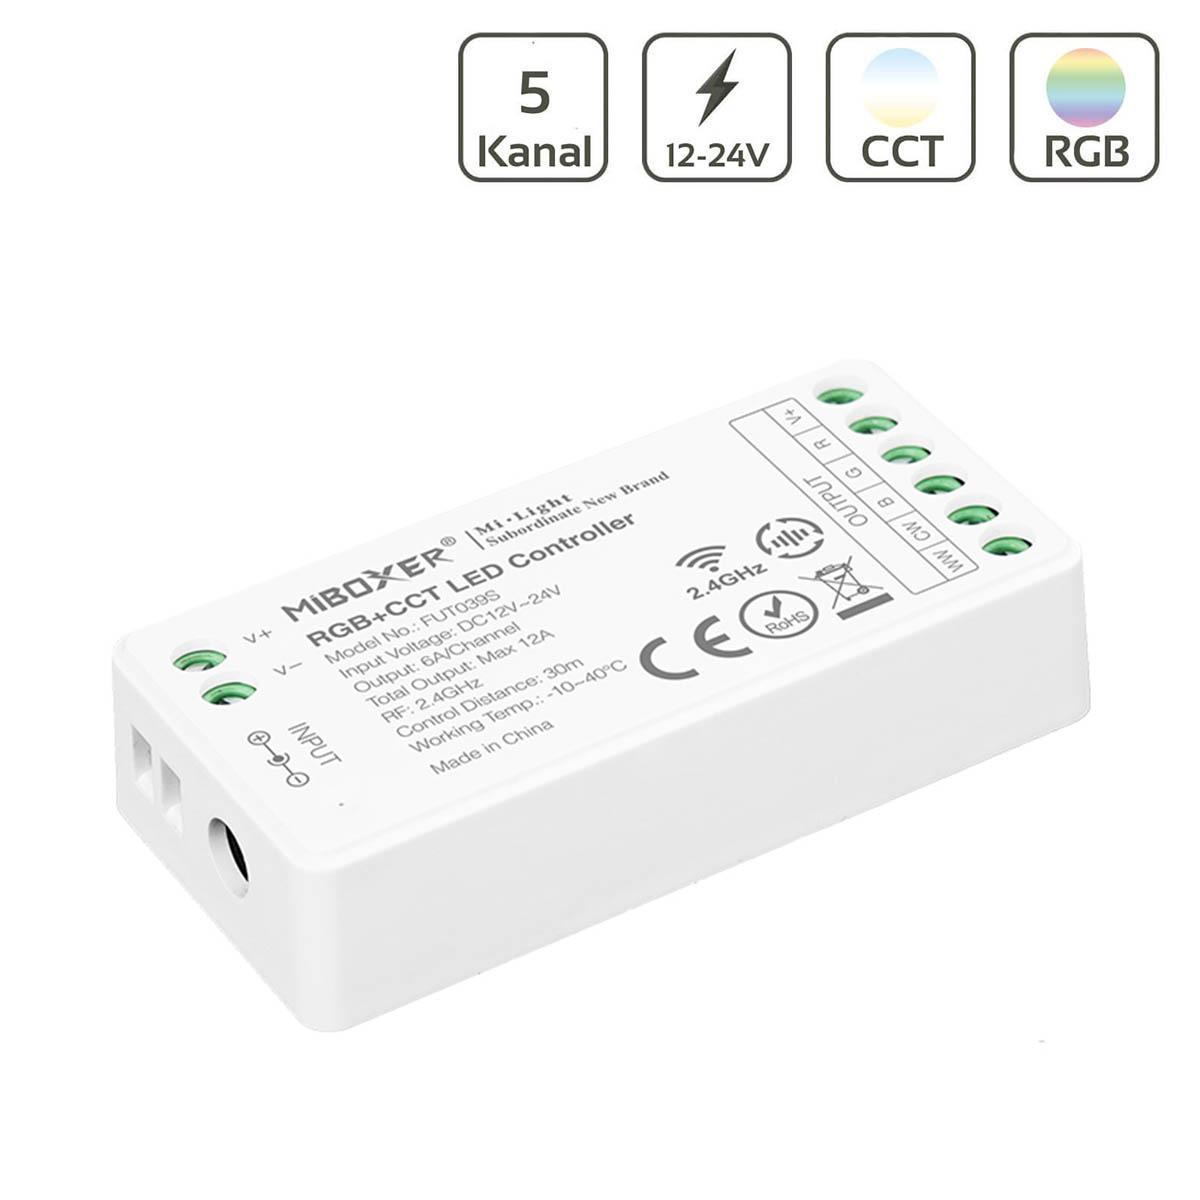 MiBoxer RGB+CCT Mini LED Controller 5 Kanal 12/24V Multifunktion LED Strip Panel Steuerung FUT039S